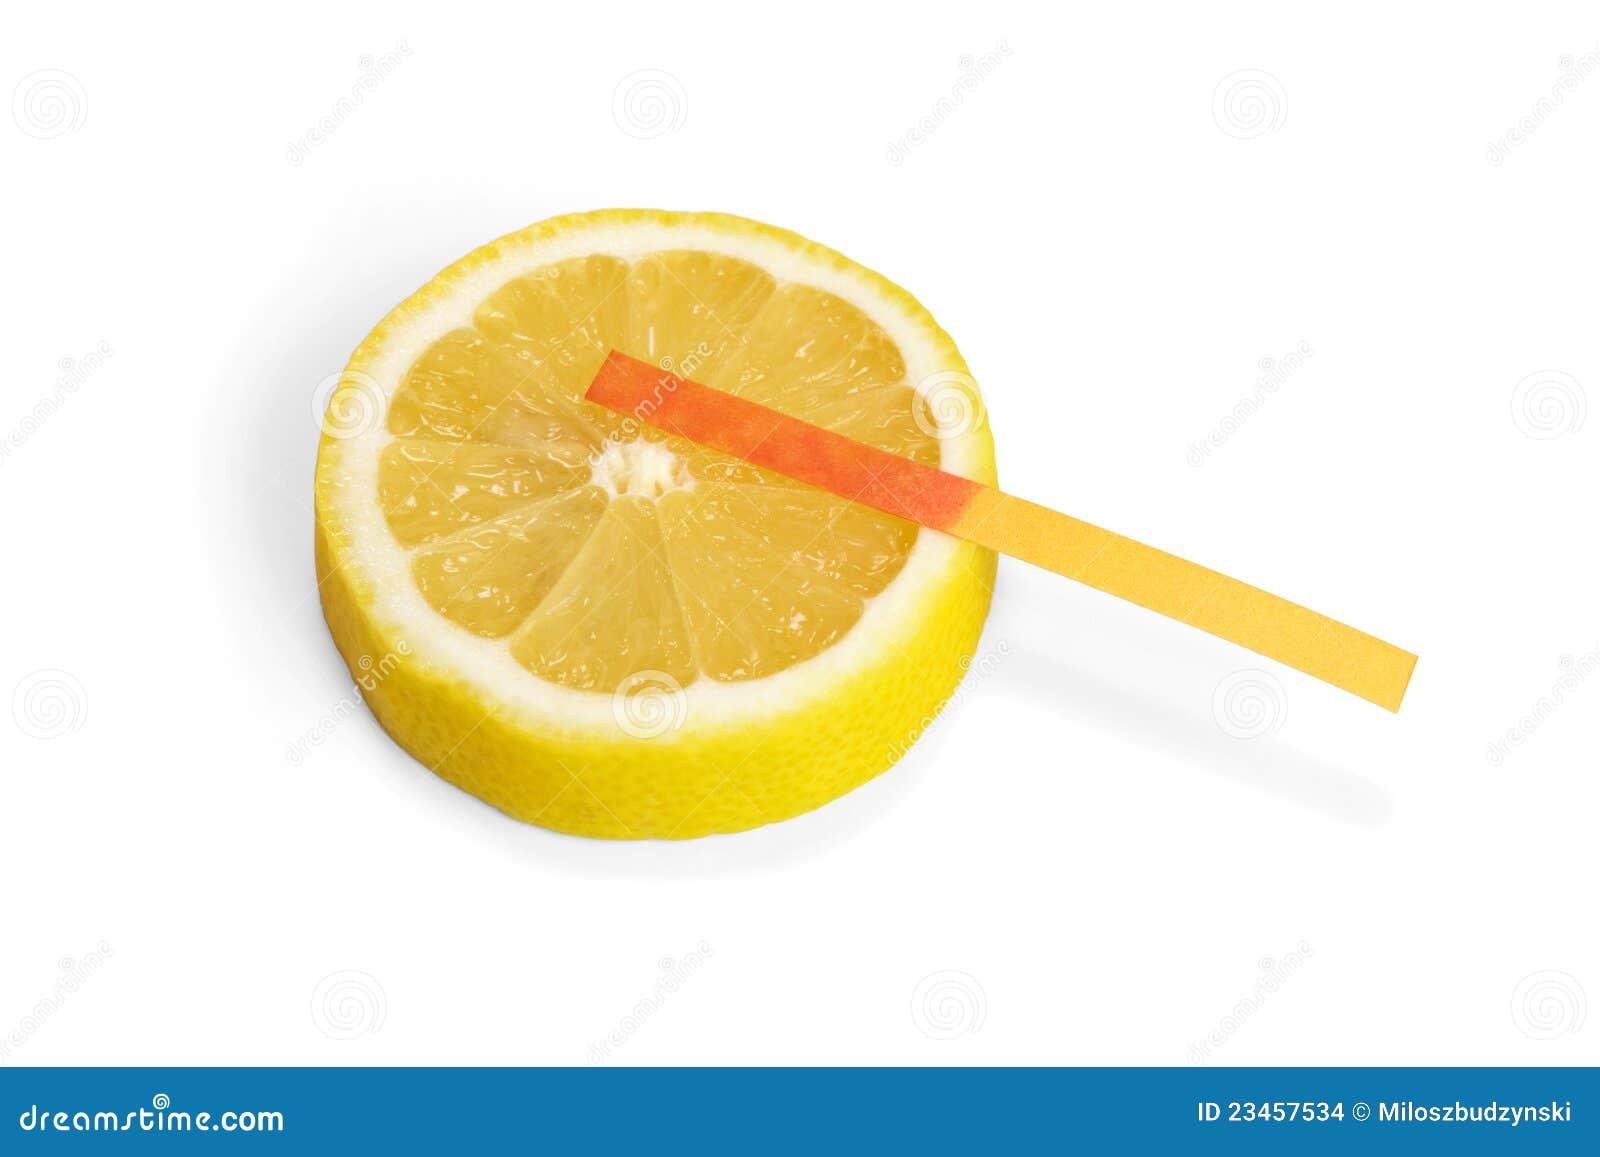 Litmus Paper On Lemon Slice Stock Photo - Image of vitamin